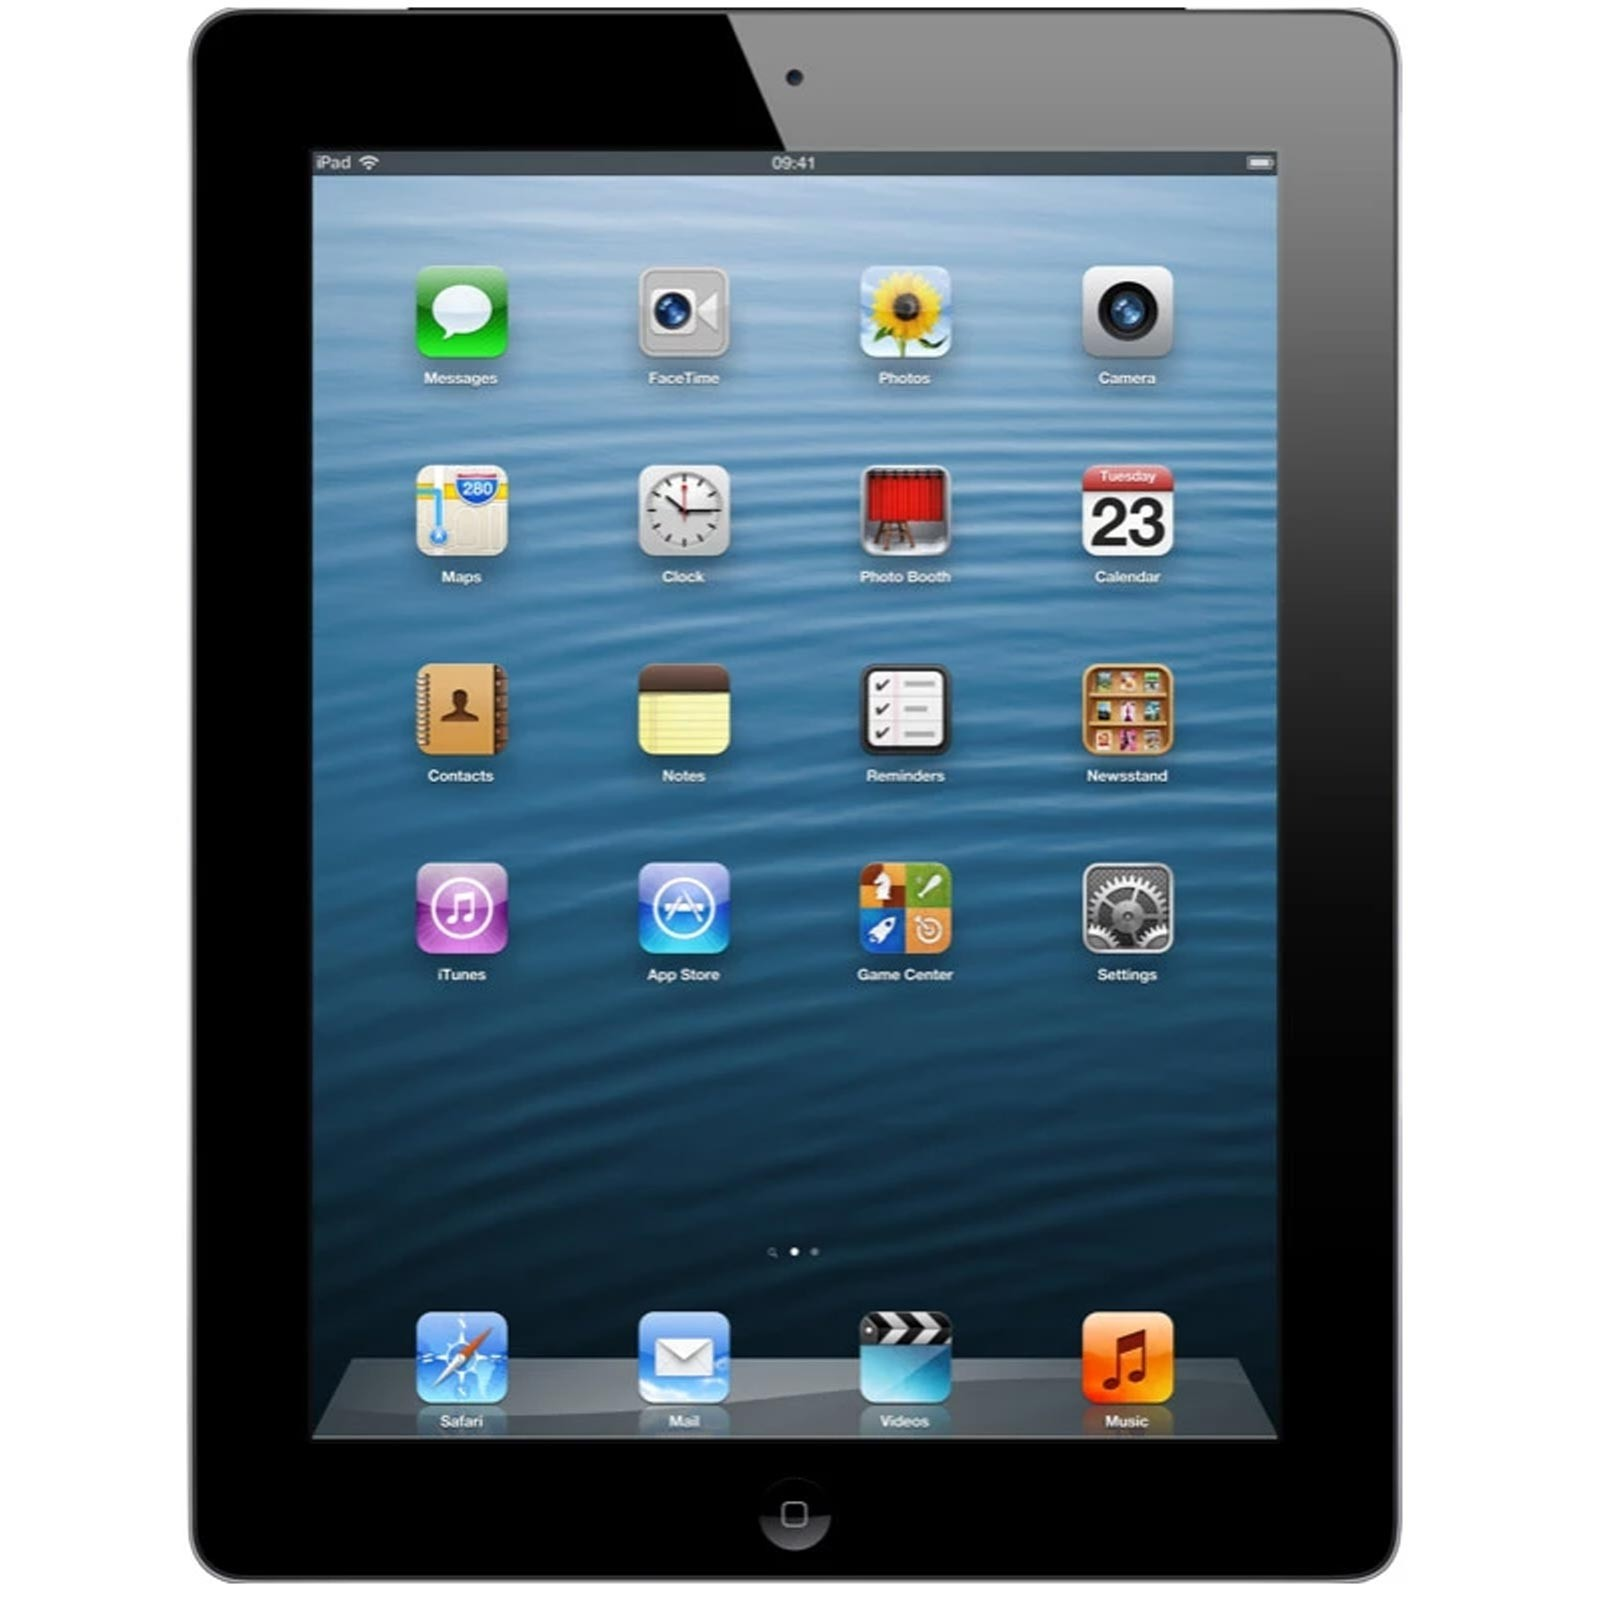 APPLE iPad 2 Wi-Fi 16GB Space Grey | A1395 MC769C/A | A+ Apple - 1